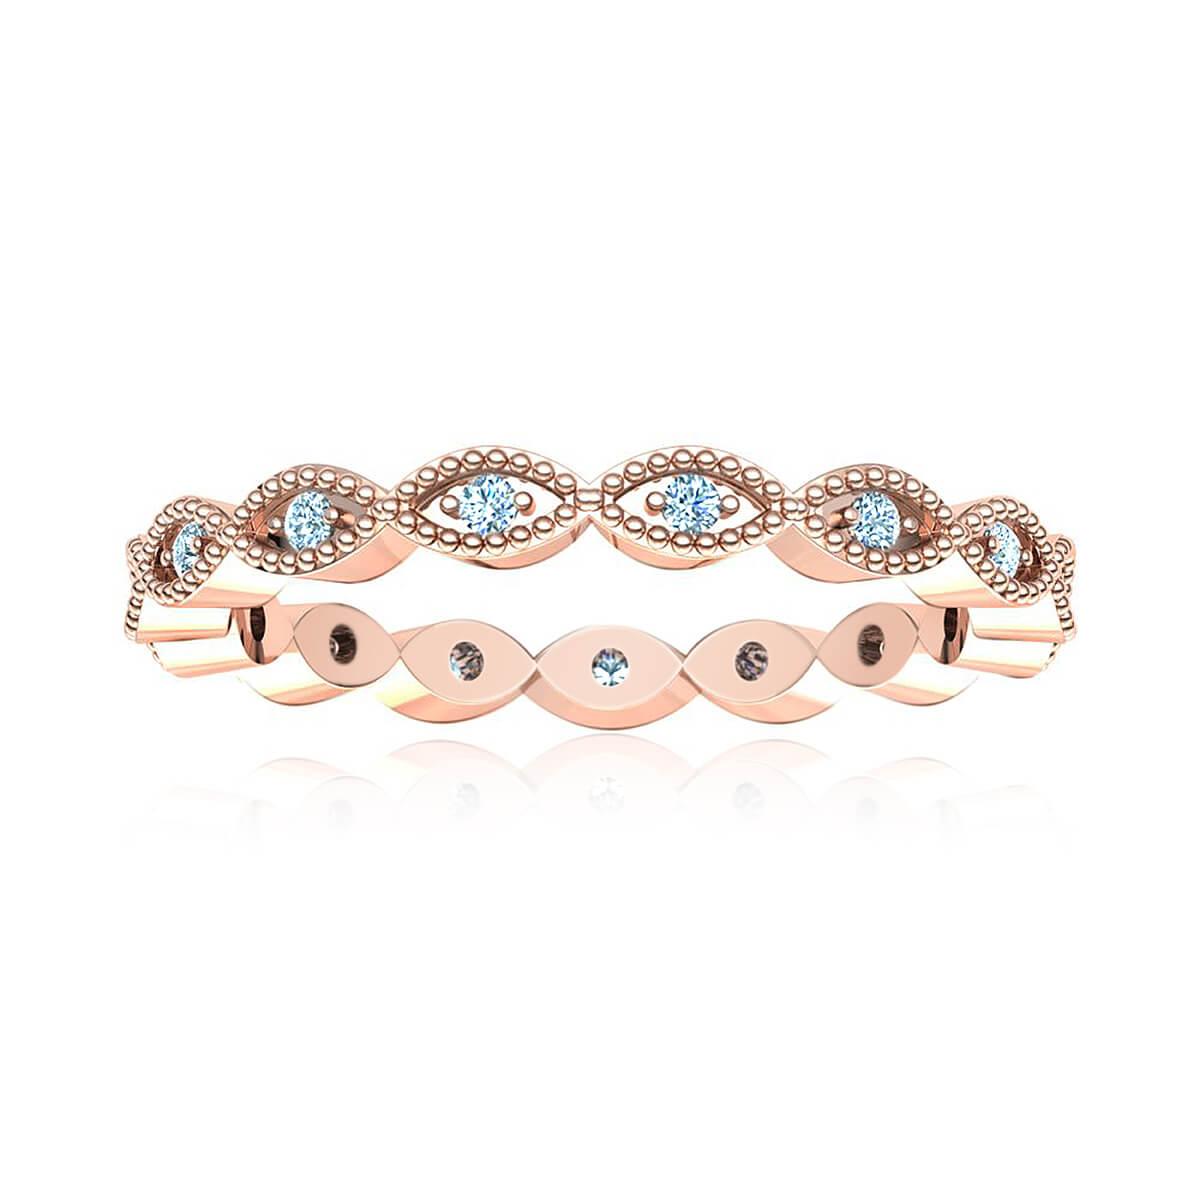 Empress Eternity Diamond Ring (1/4 CT. TW.)